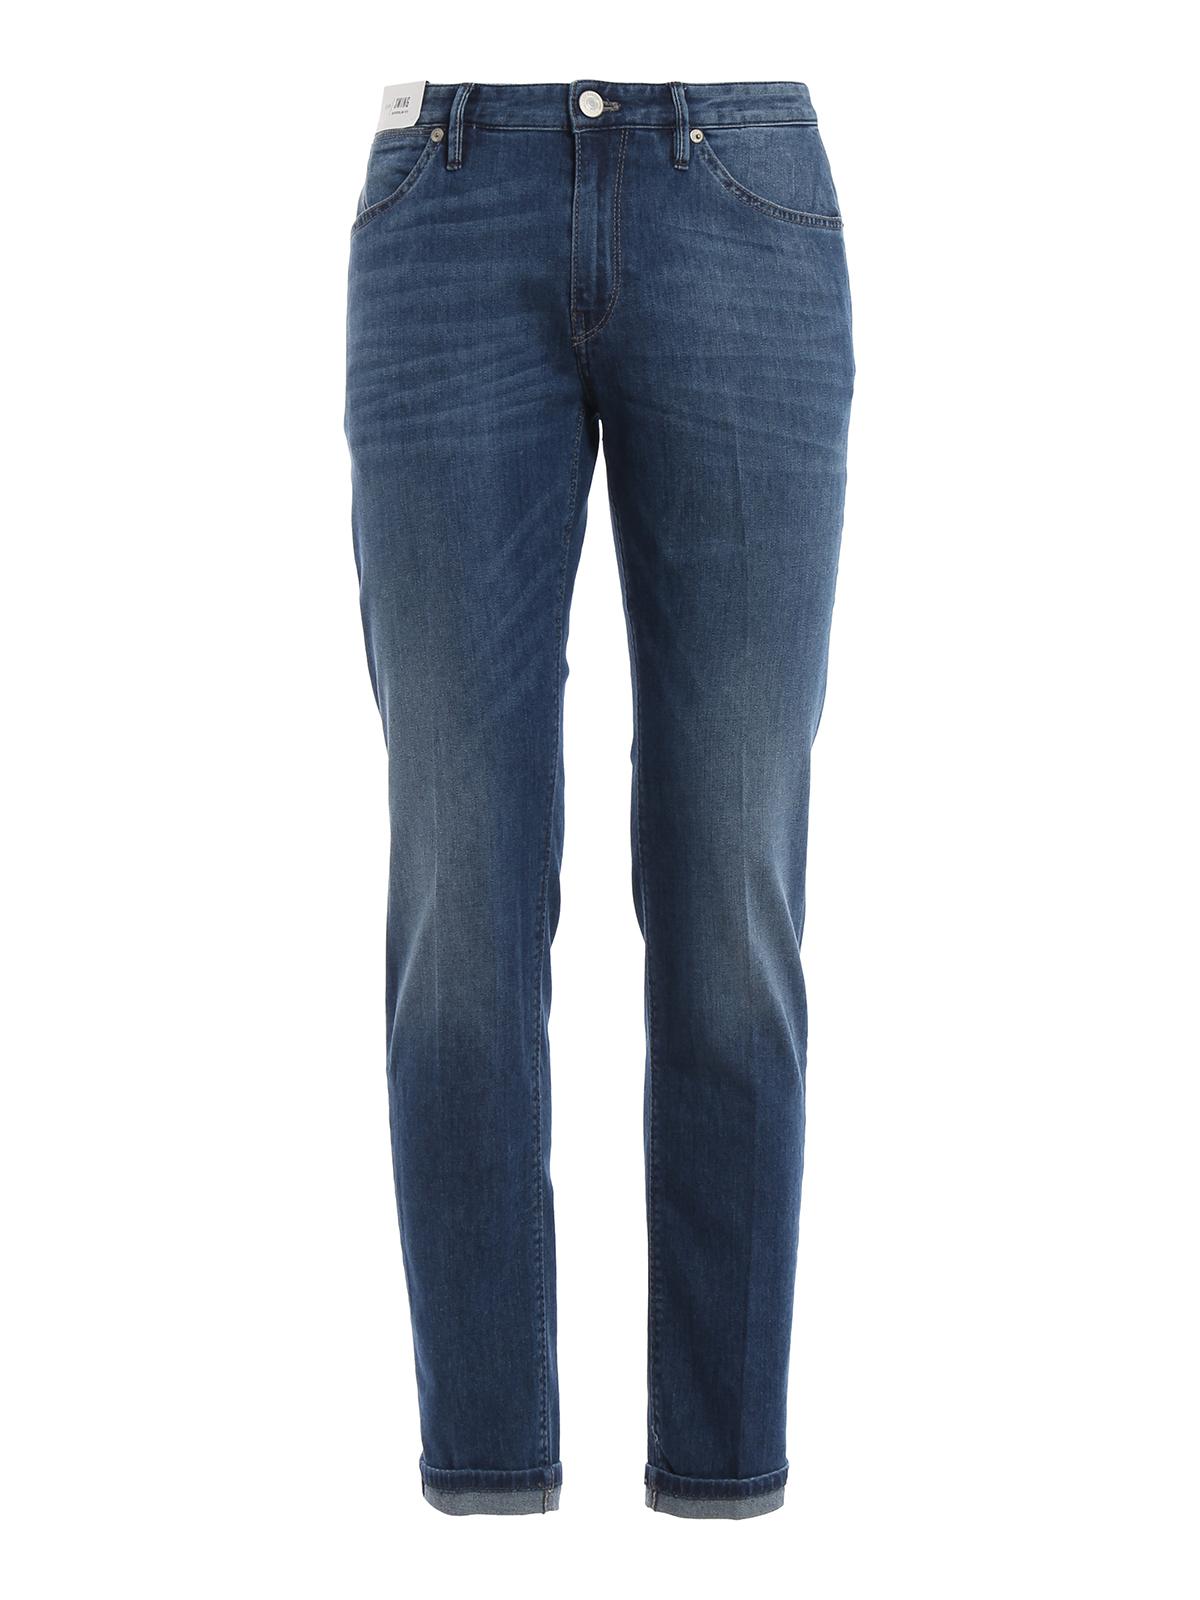 jeans swing com